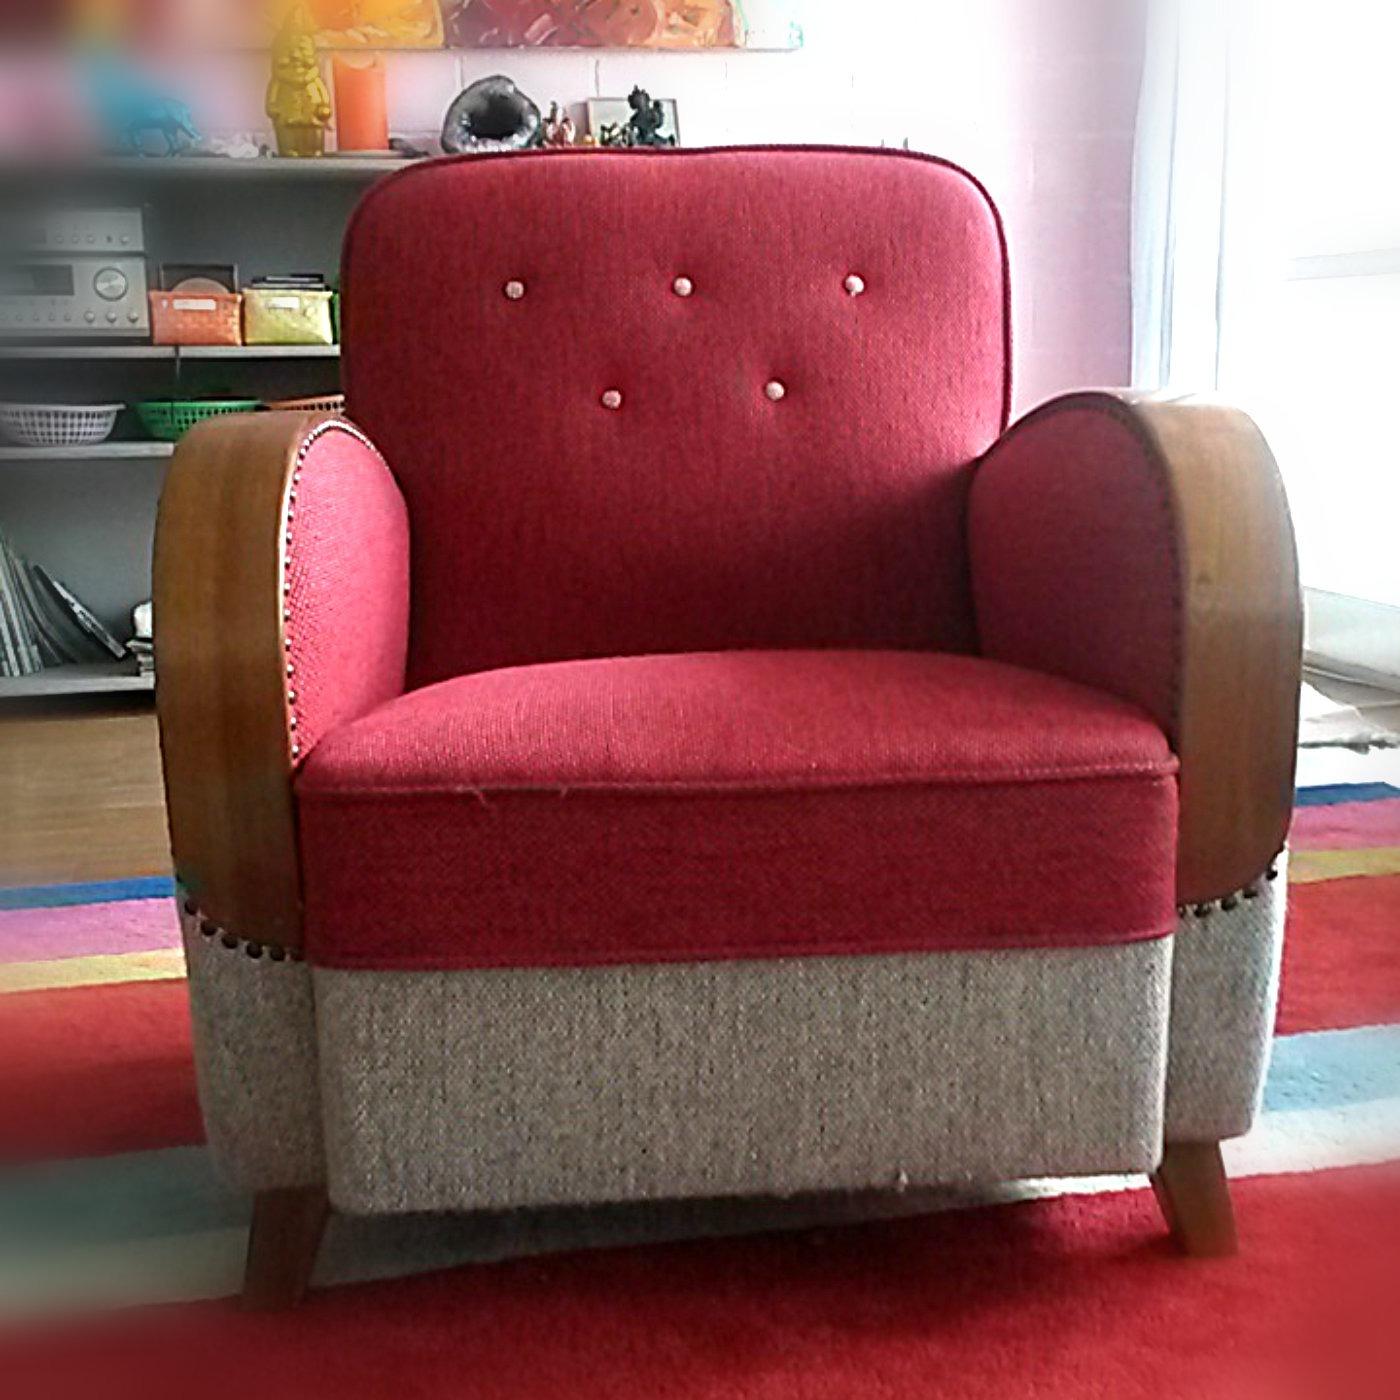 restaurieren monig z 39 rotz. Black Bedroom Furniture Sets. Home Design Ideas